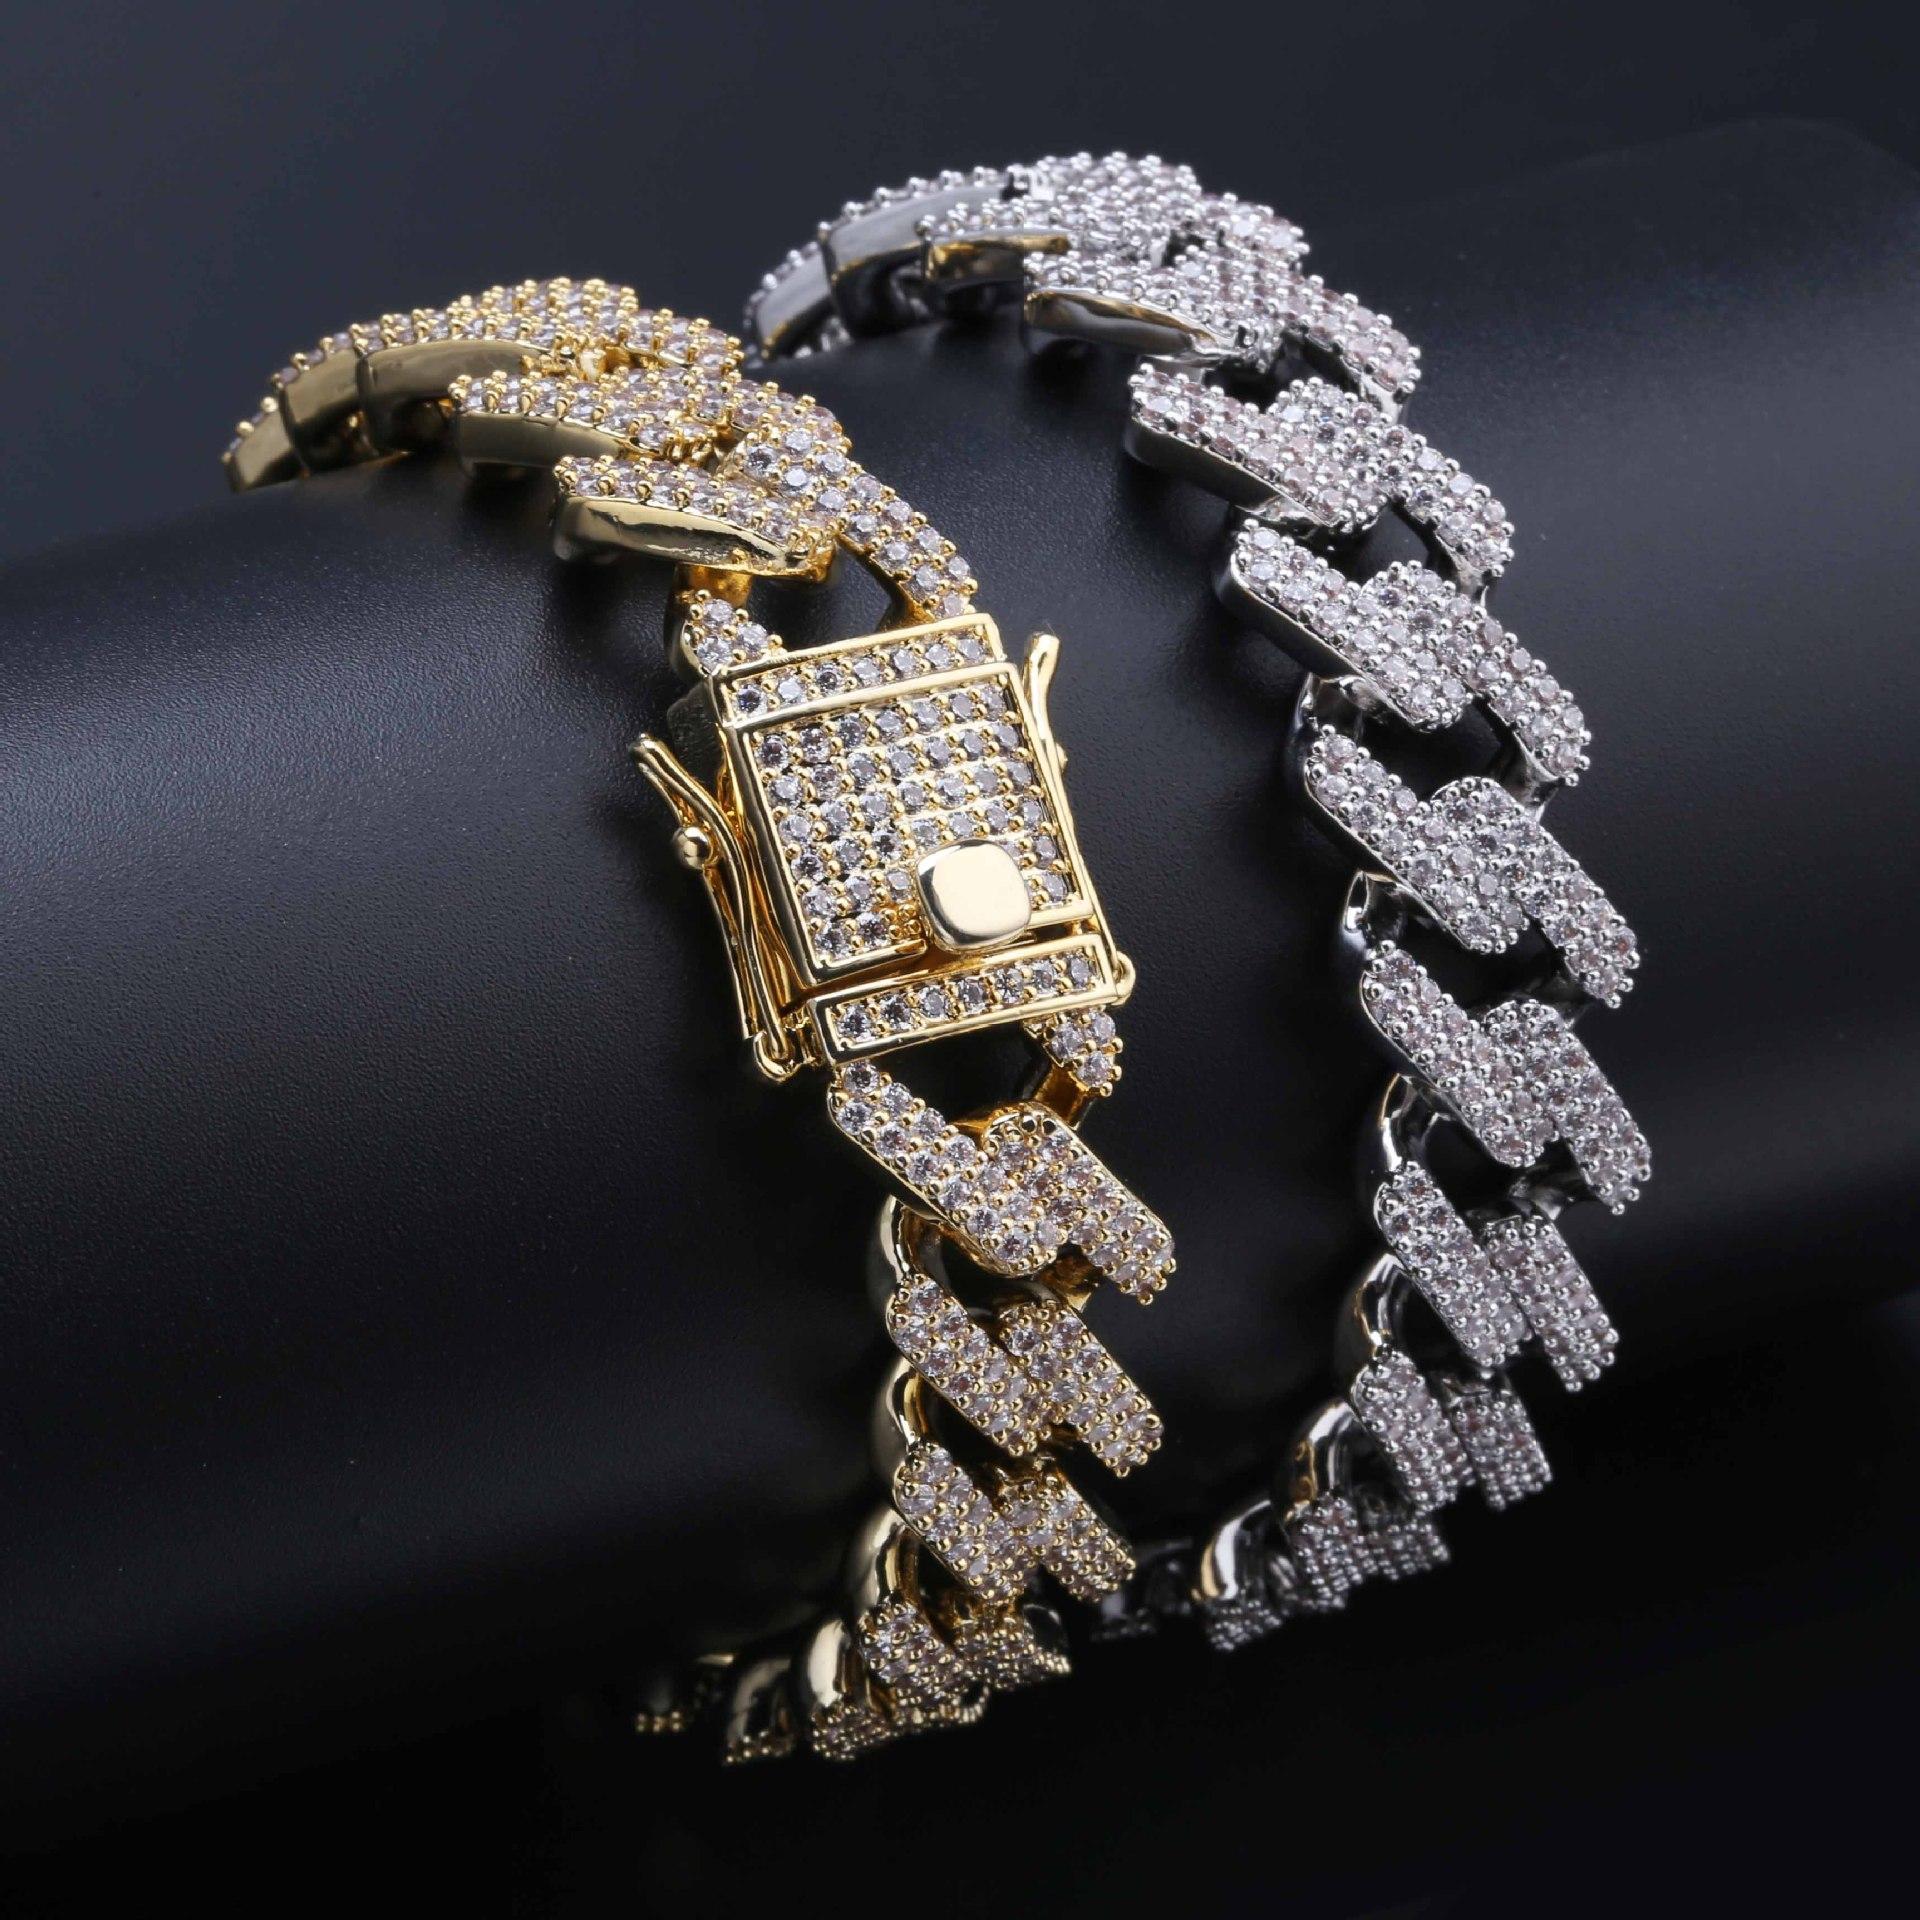 2019 transfronteiriço exclusivo para hiphop hip hop jóias cadeia cubana micro-studded zircon strip pulseira masculina